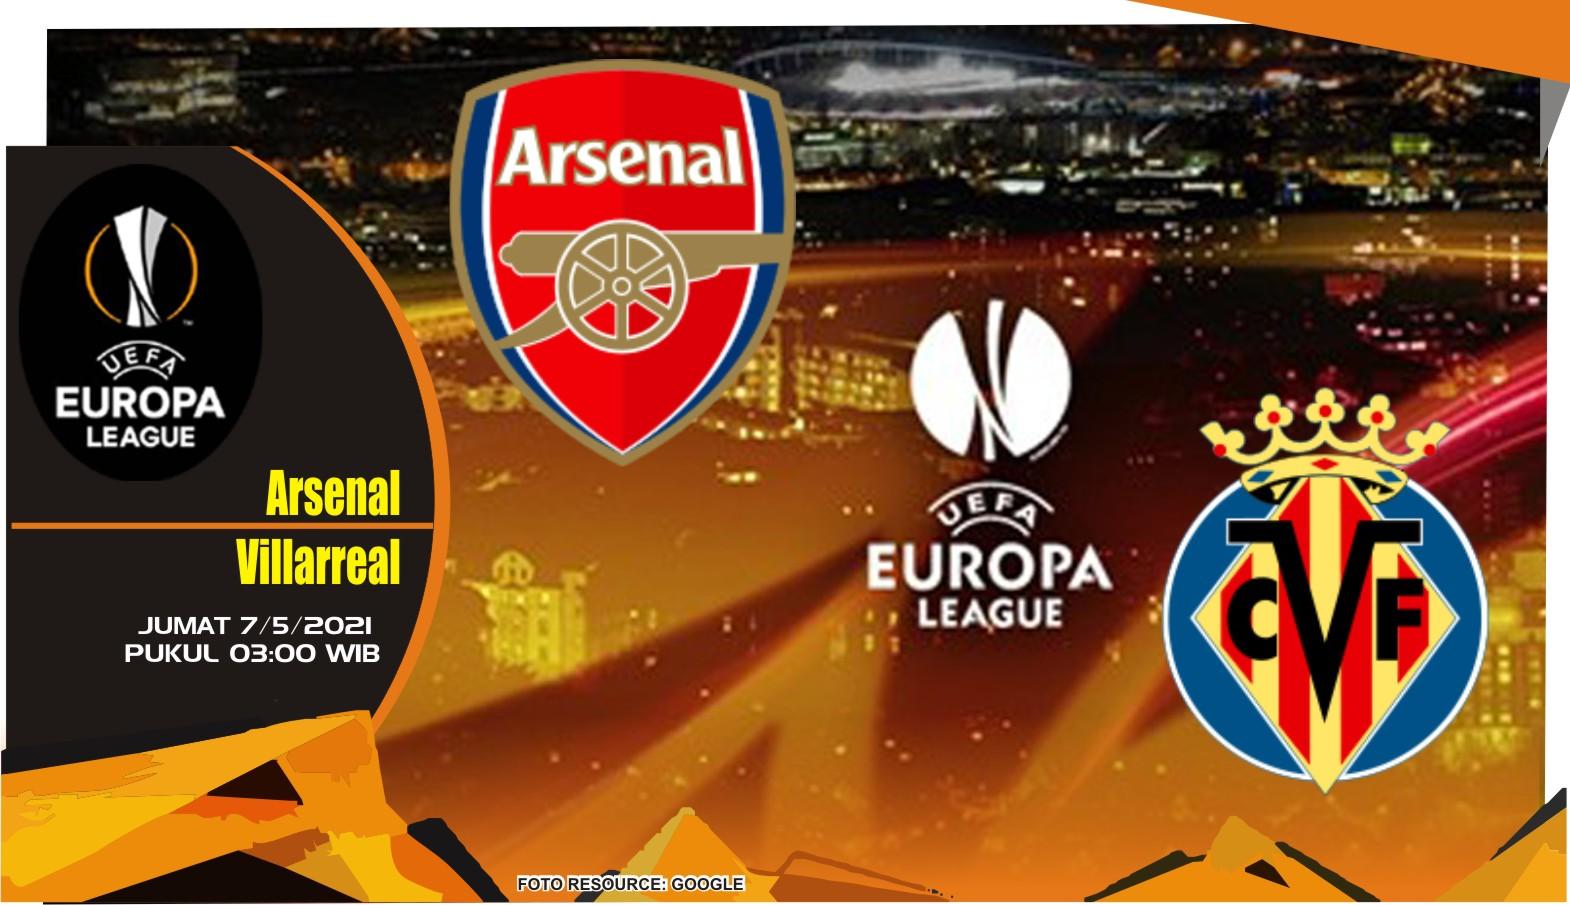 Prediksi Liga Eropa: Arsenal vs Villarreal - 7 Mei 2021